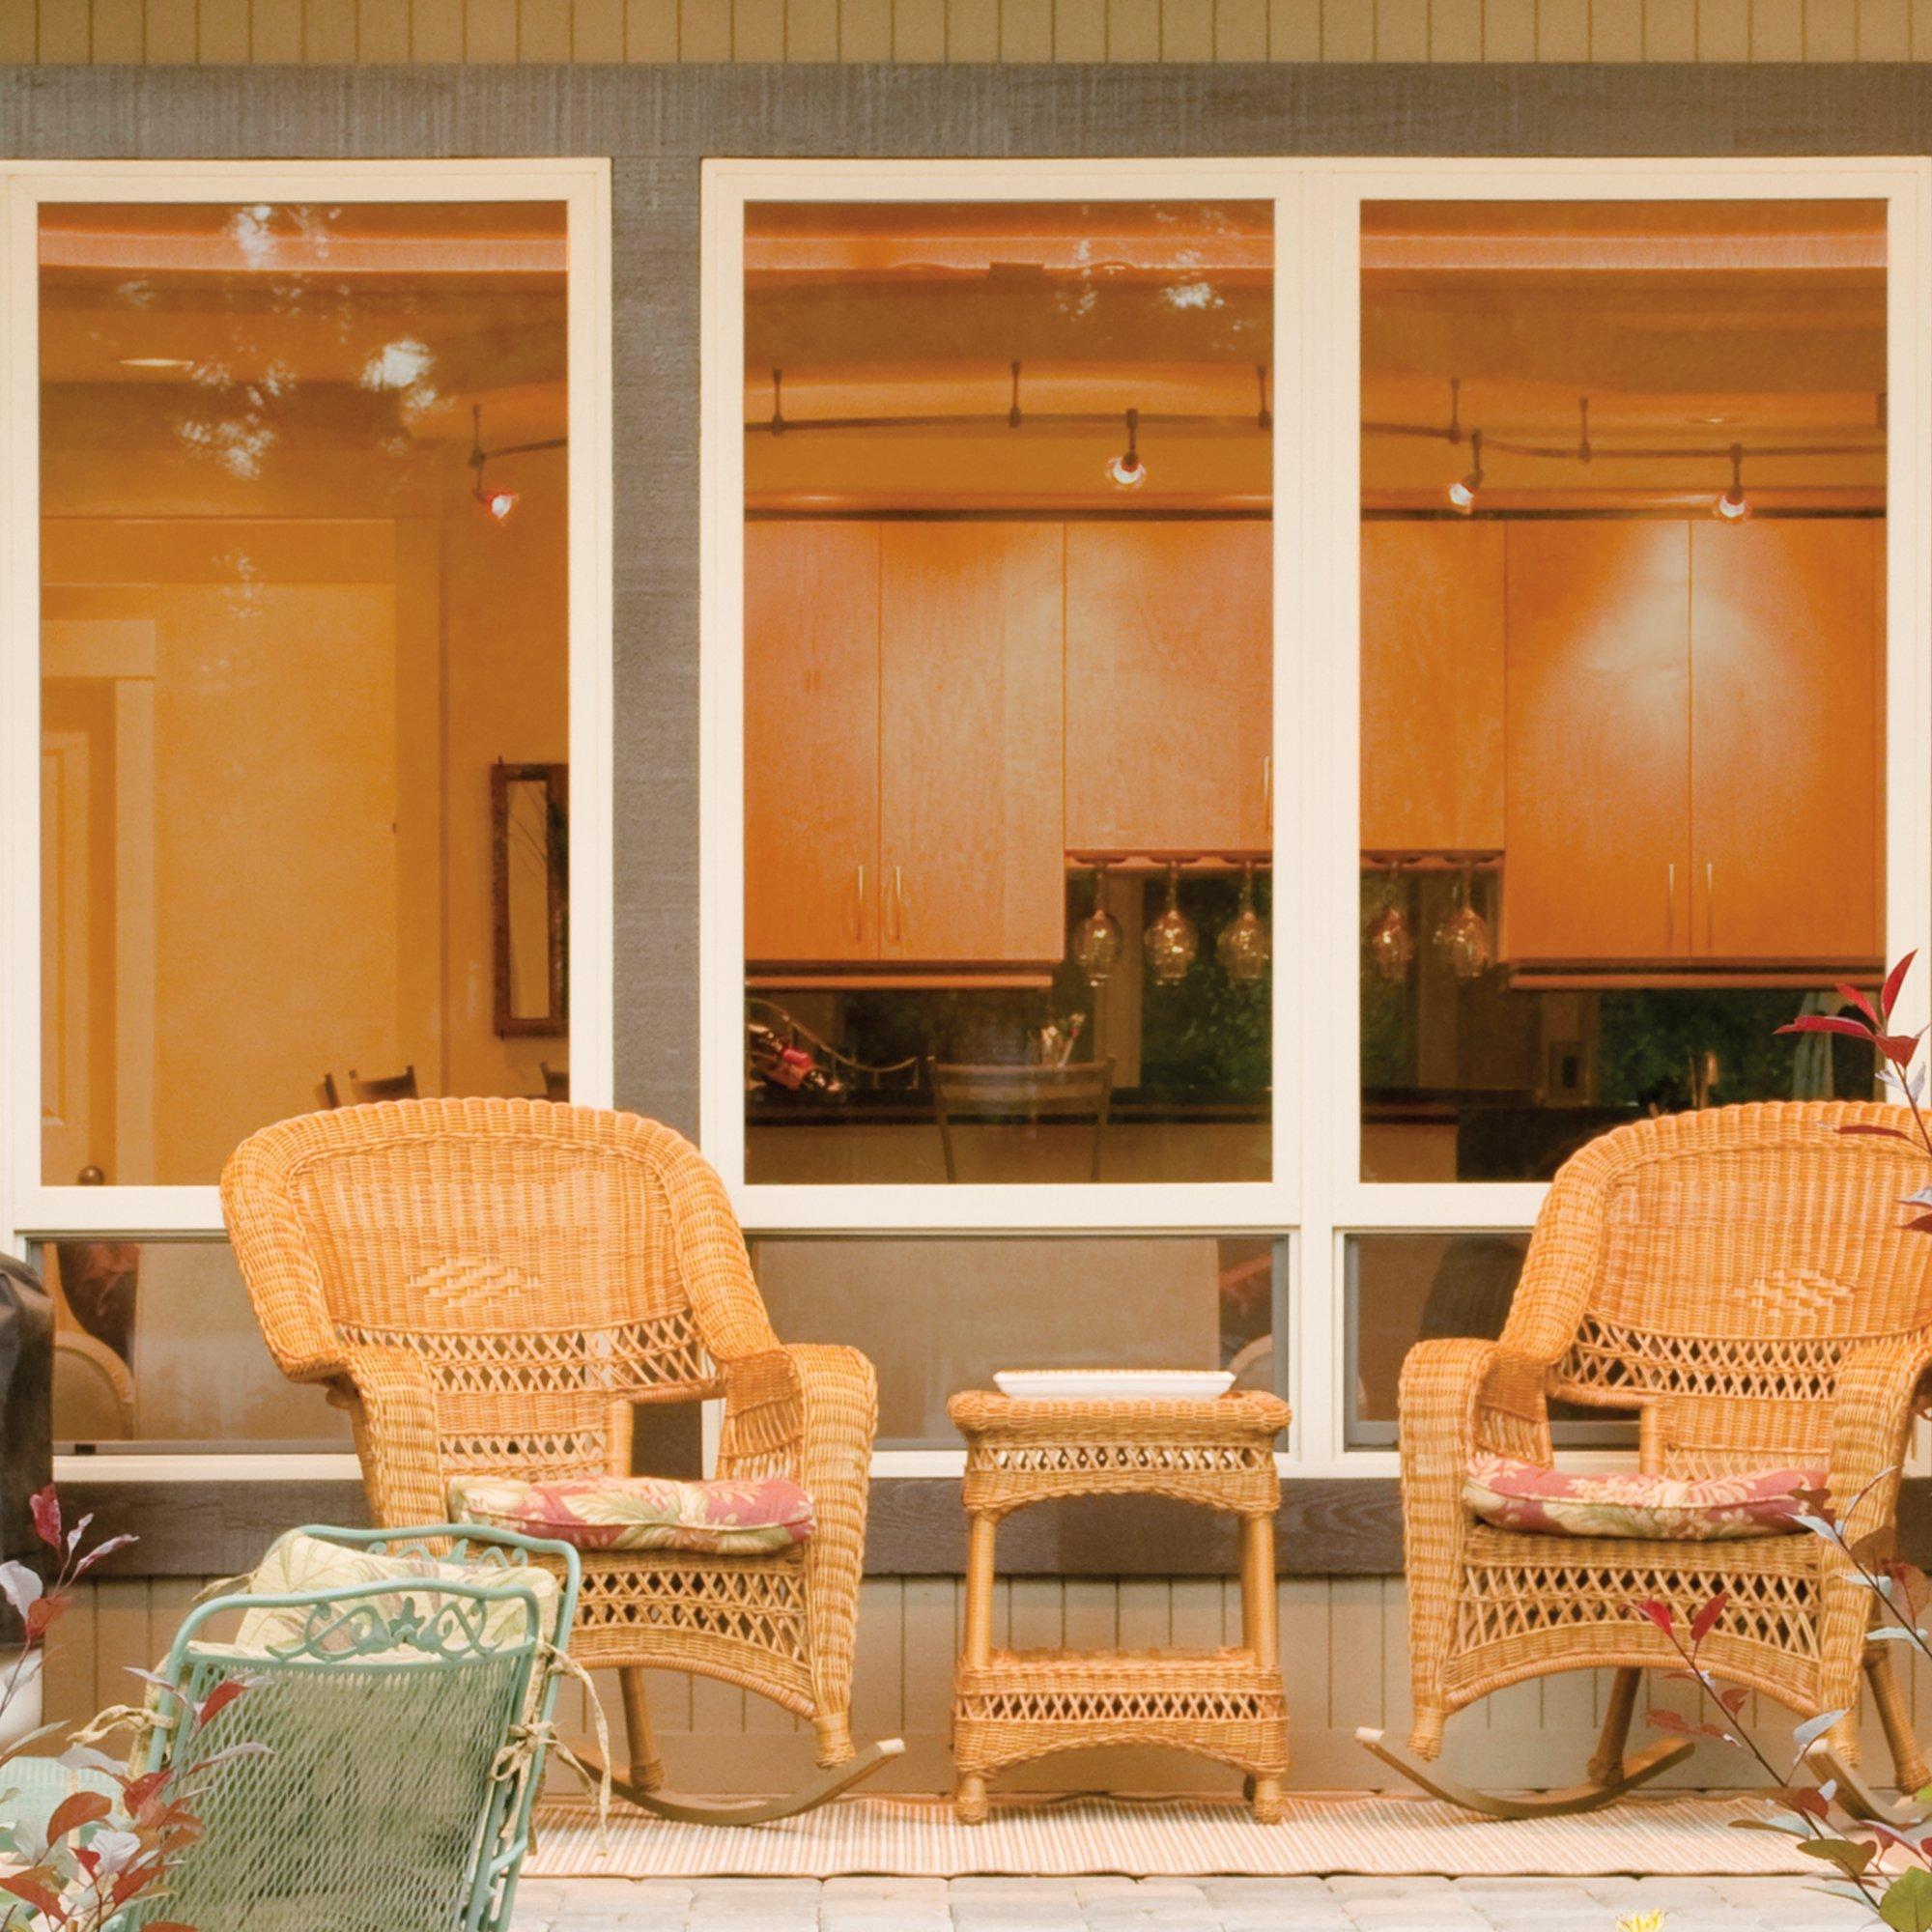 Gila EGSG548 48 Inches by 100 Feet Heat Control Residential Window Film, Platinum by Gila (Image #4)